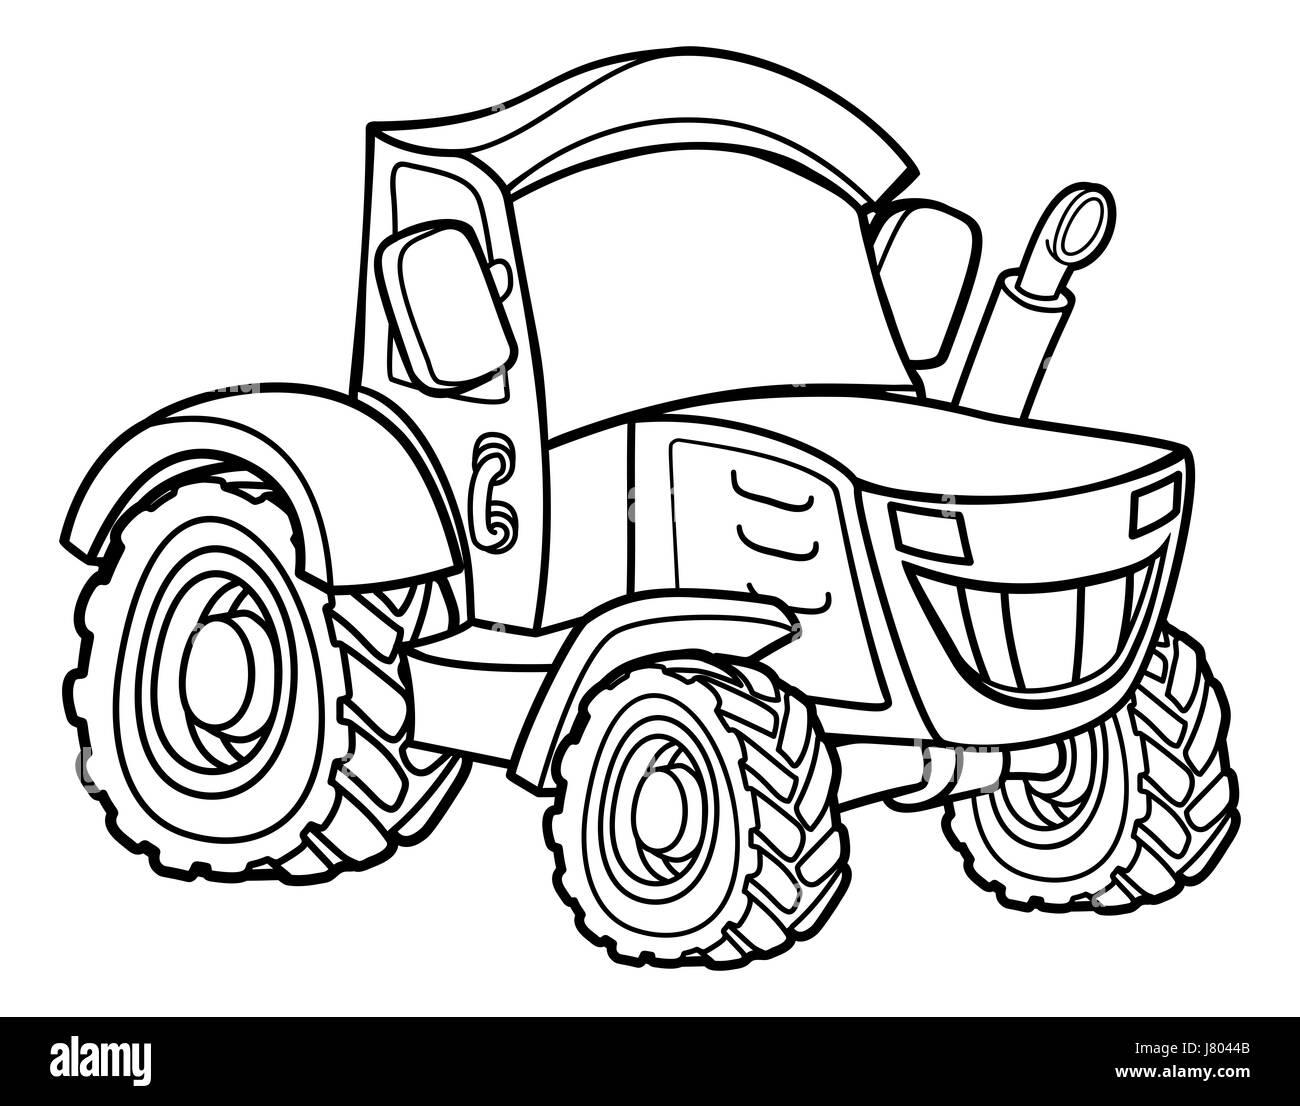 Tractor Cartoon Farm Vehicle Illustration Stock Photo 142603451 Alamy